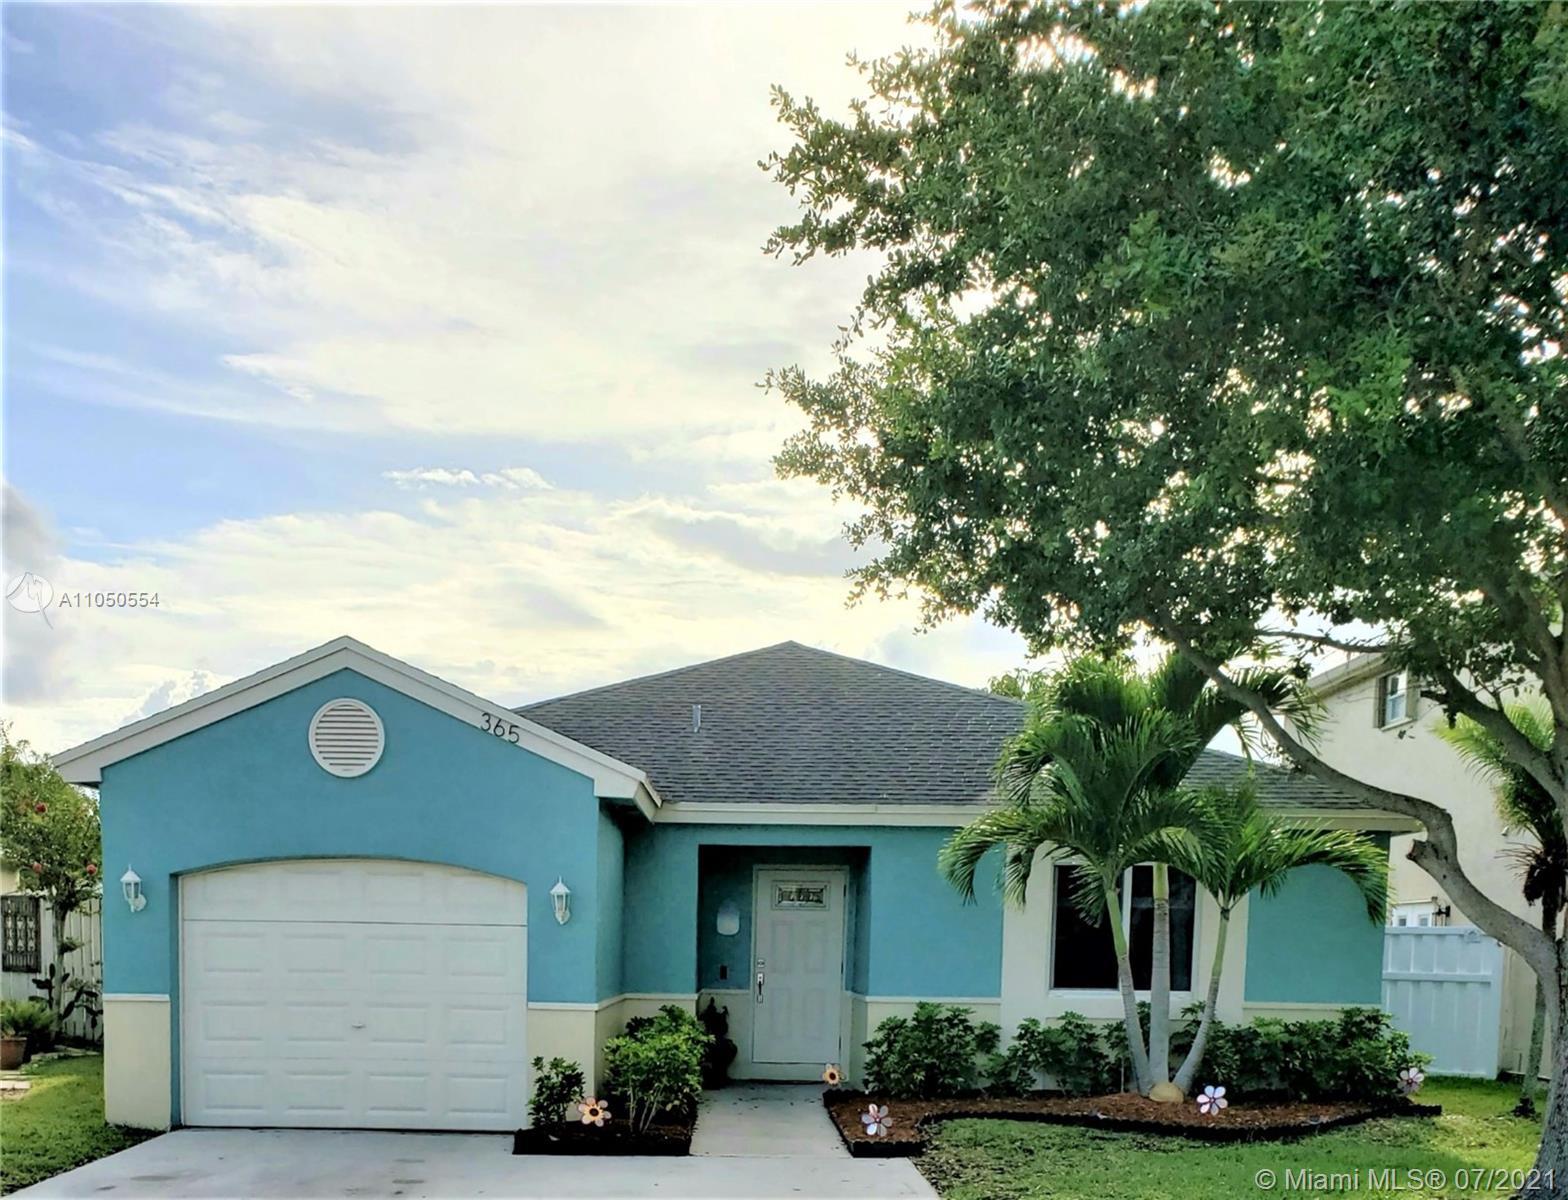 New River Estates - 365 W Riverbend Dr, Sunrise, FL 33326